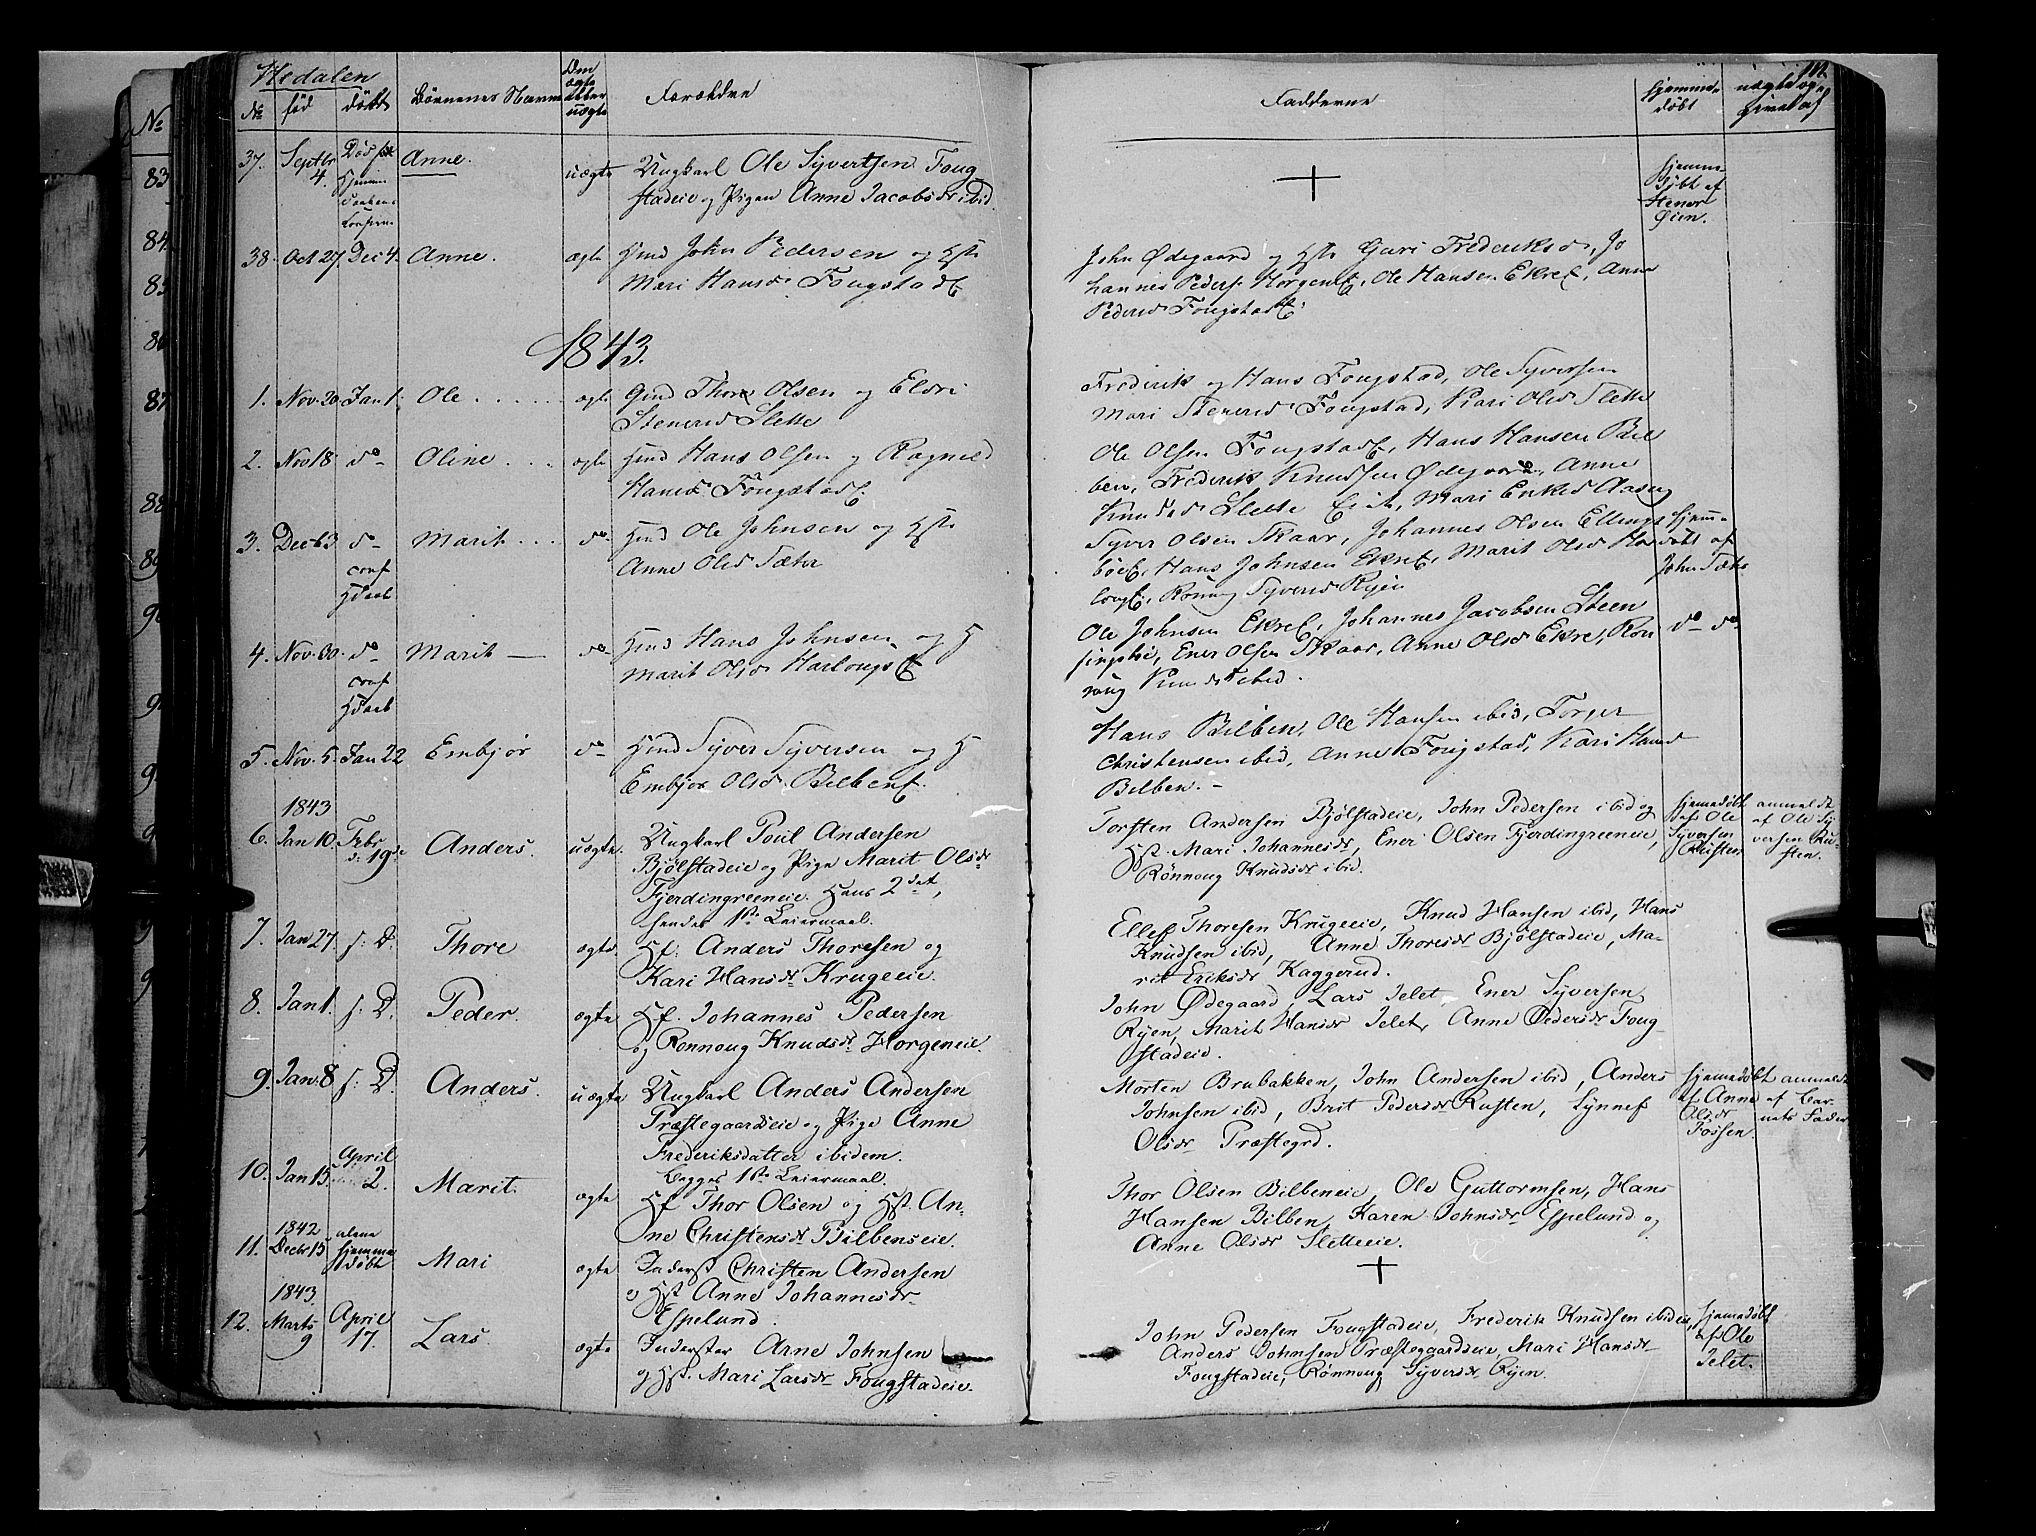 SAH, Vågå prestekontor, Ministerialbok nr. 5 /2, 1842-1856, s. 111